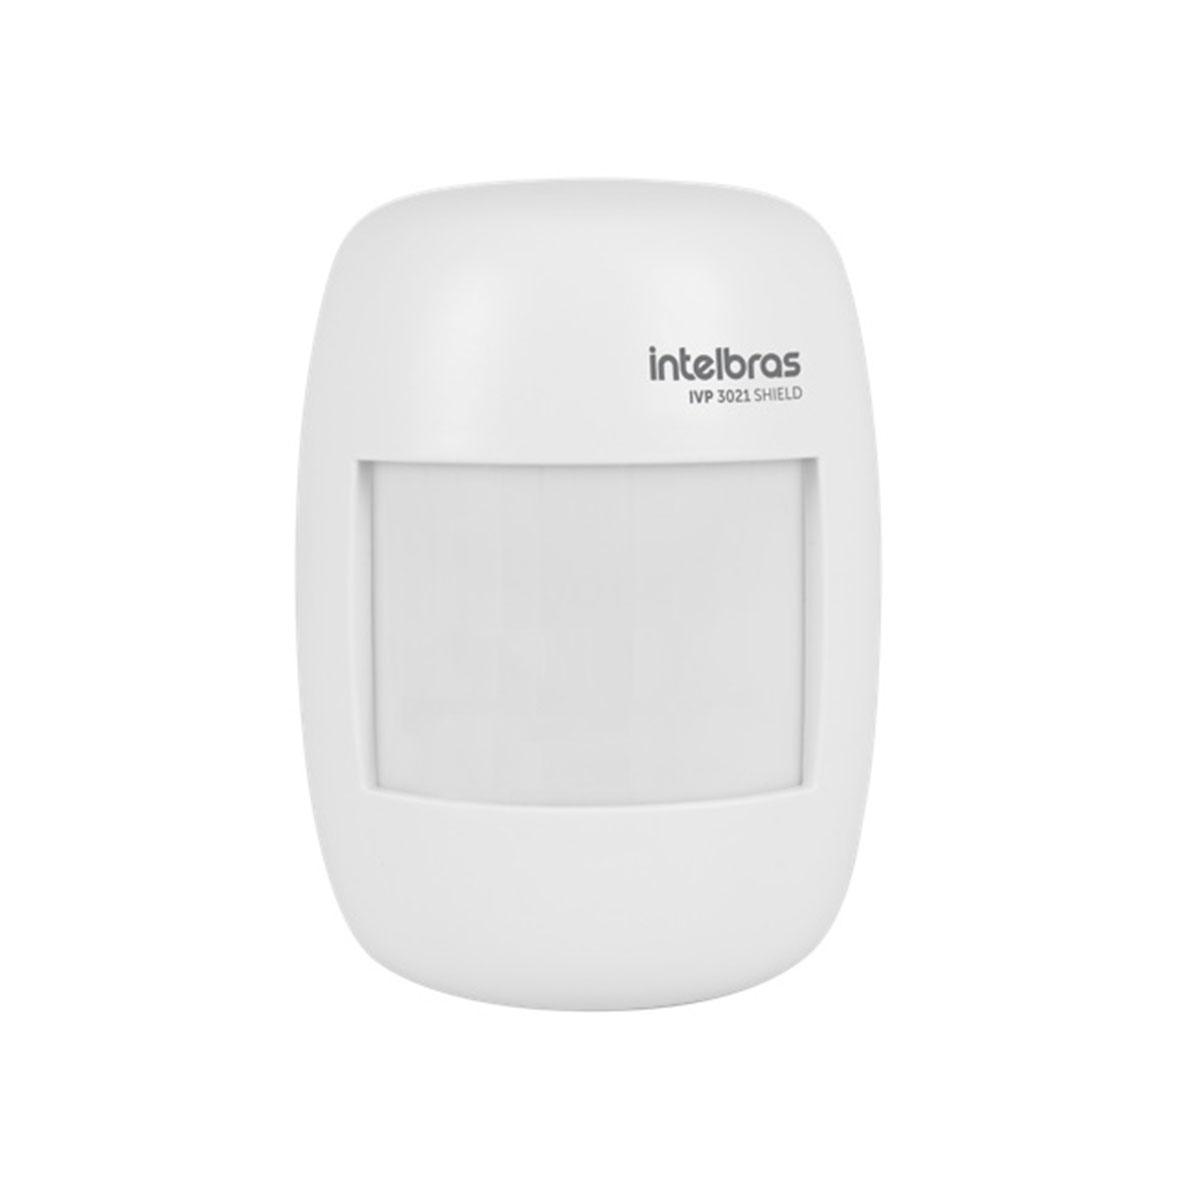 Kit 08 Sensor Interno Com Fio Intelbras Ivp 3021 Shield